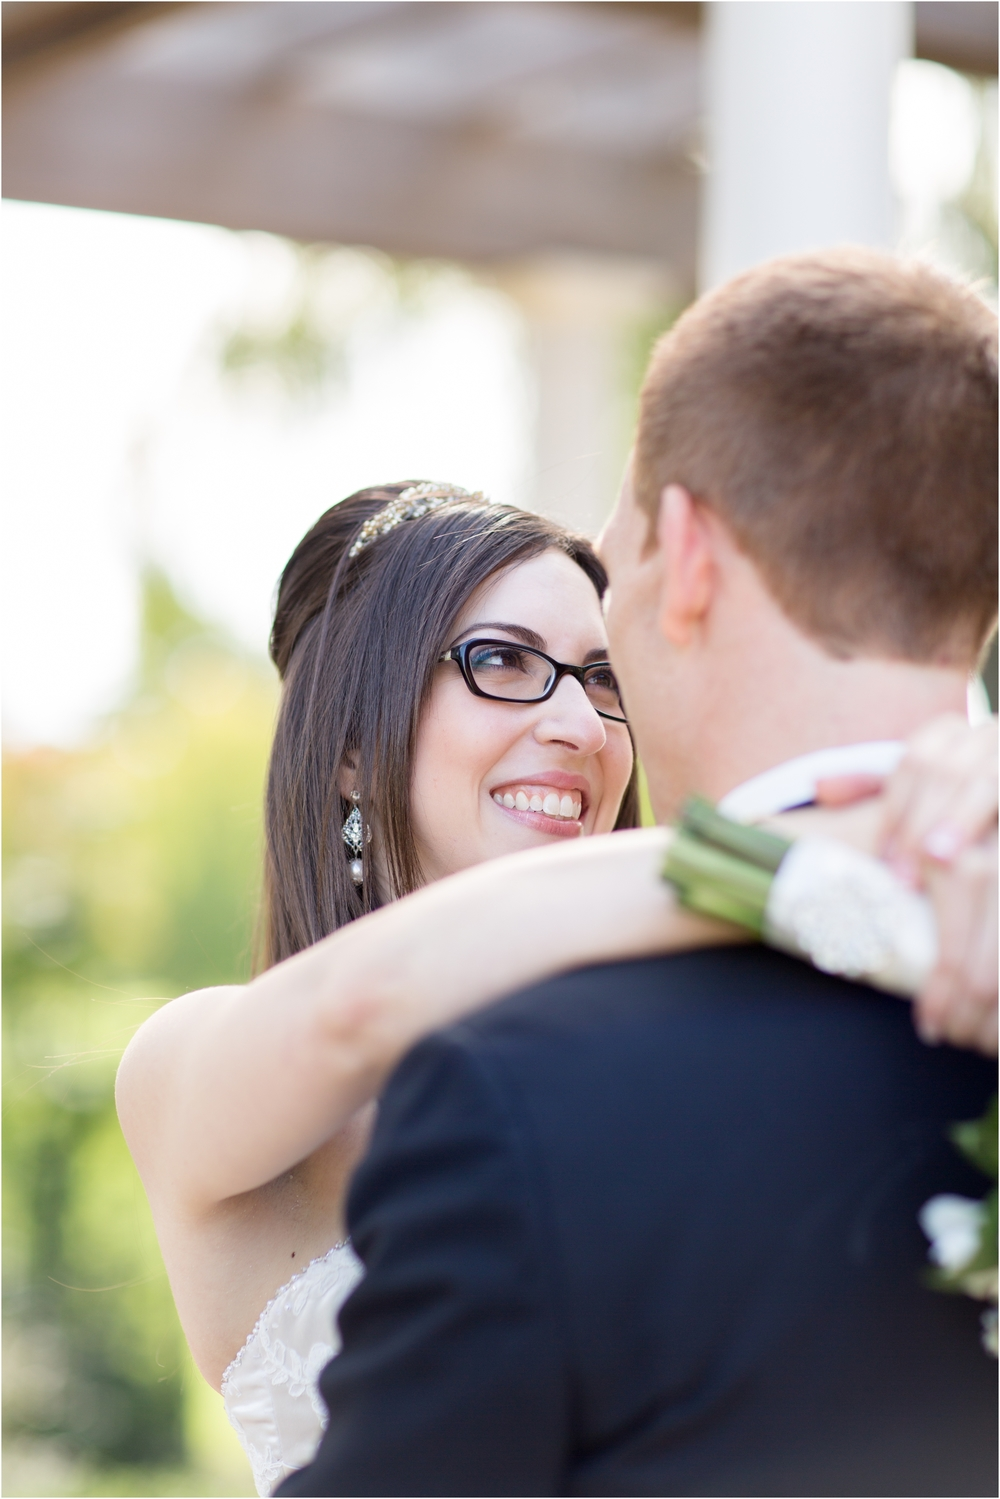 Elhai-Wedding-3-Bride-and-Groom-492.jpg